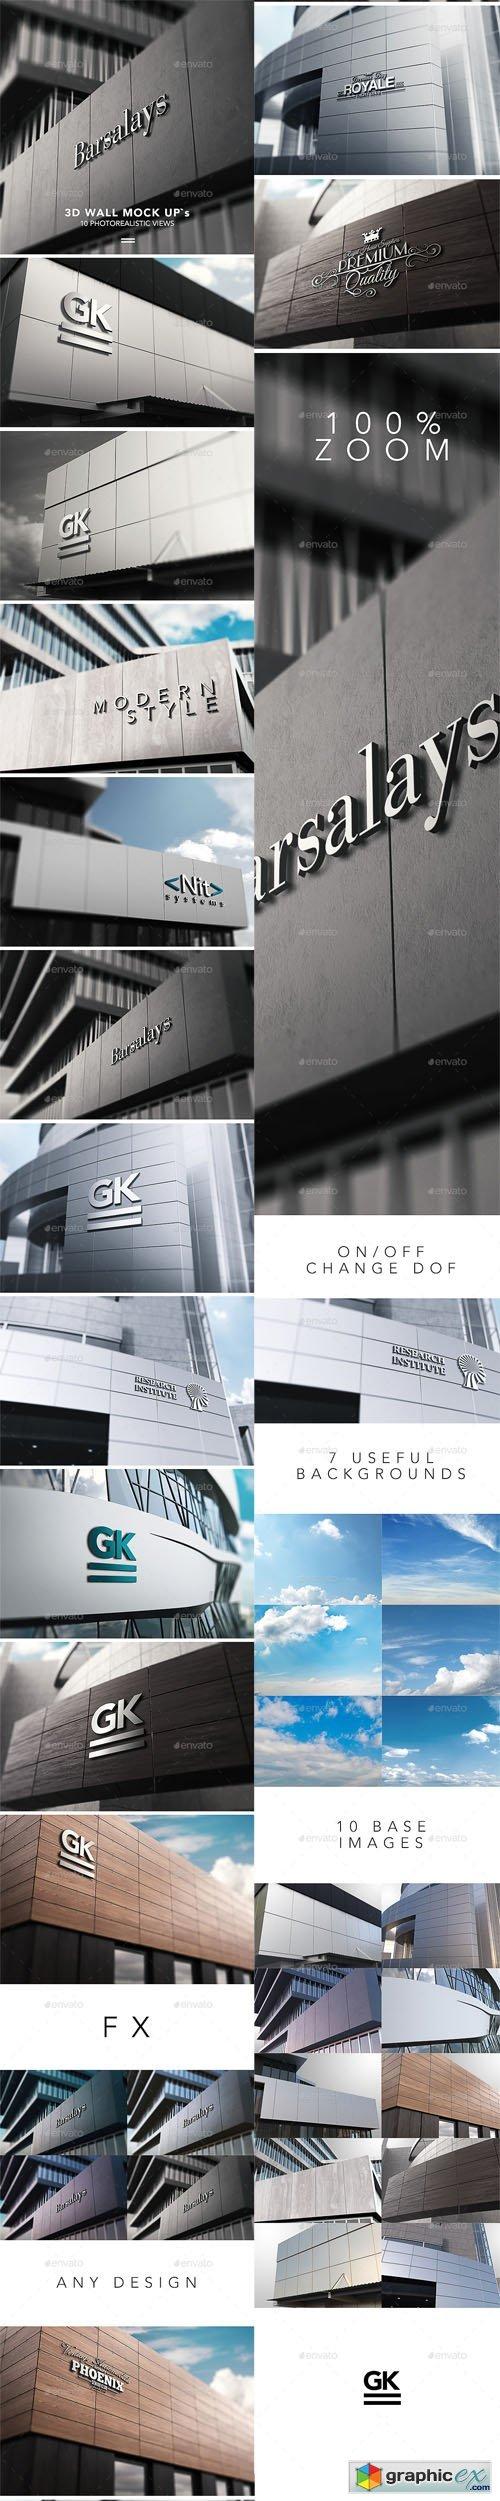 3d logo signage wall mock up 14345872  u00bb free download